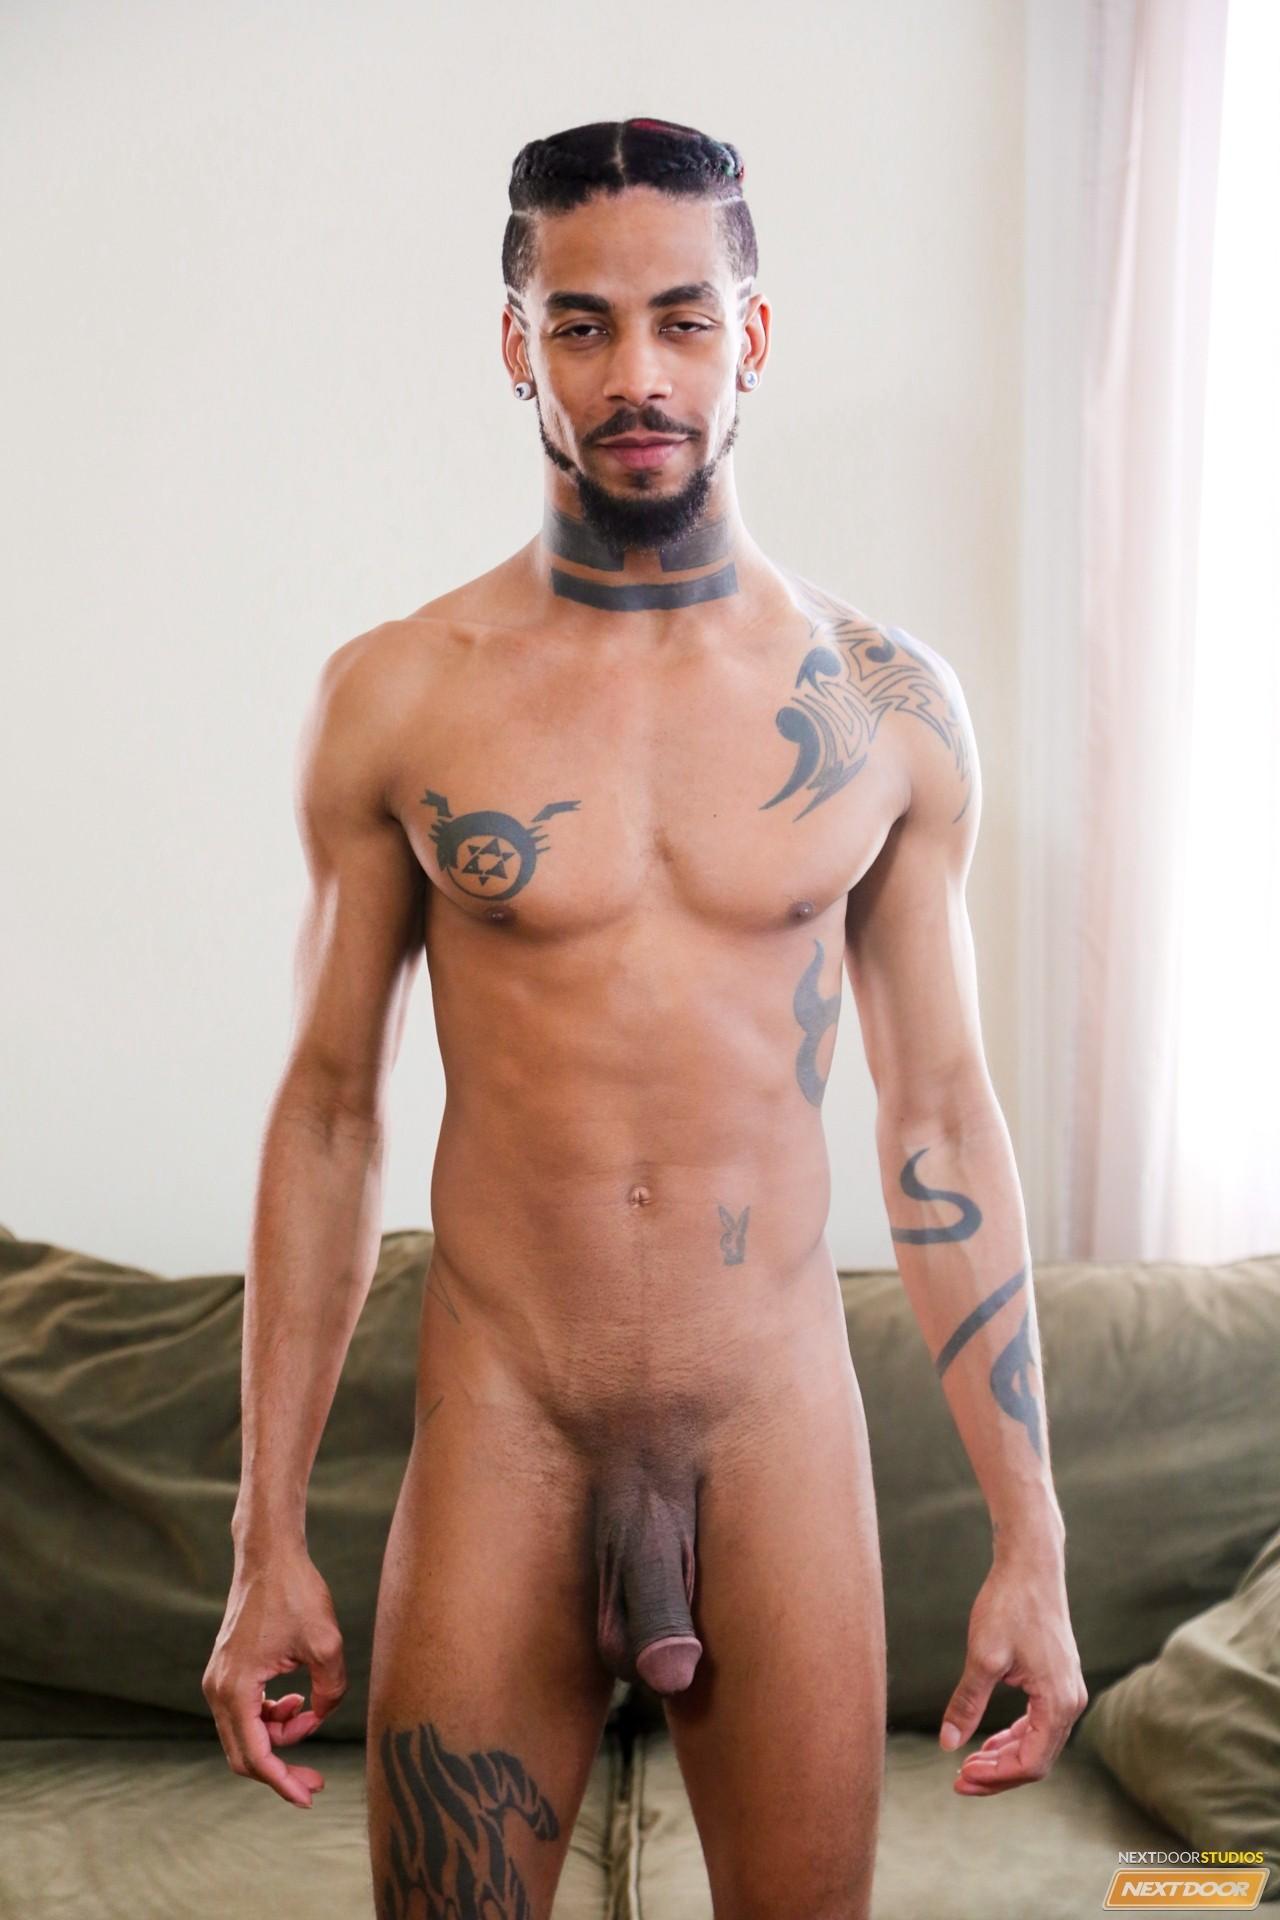 Next door ebony male